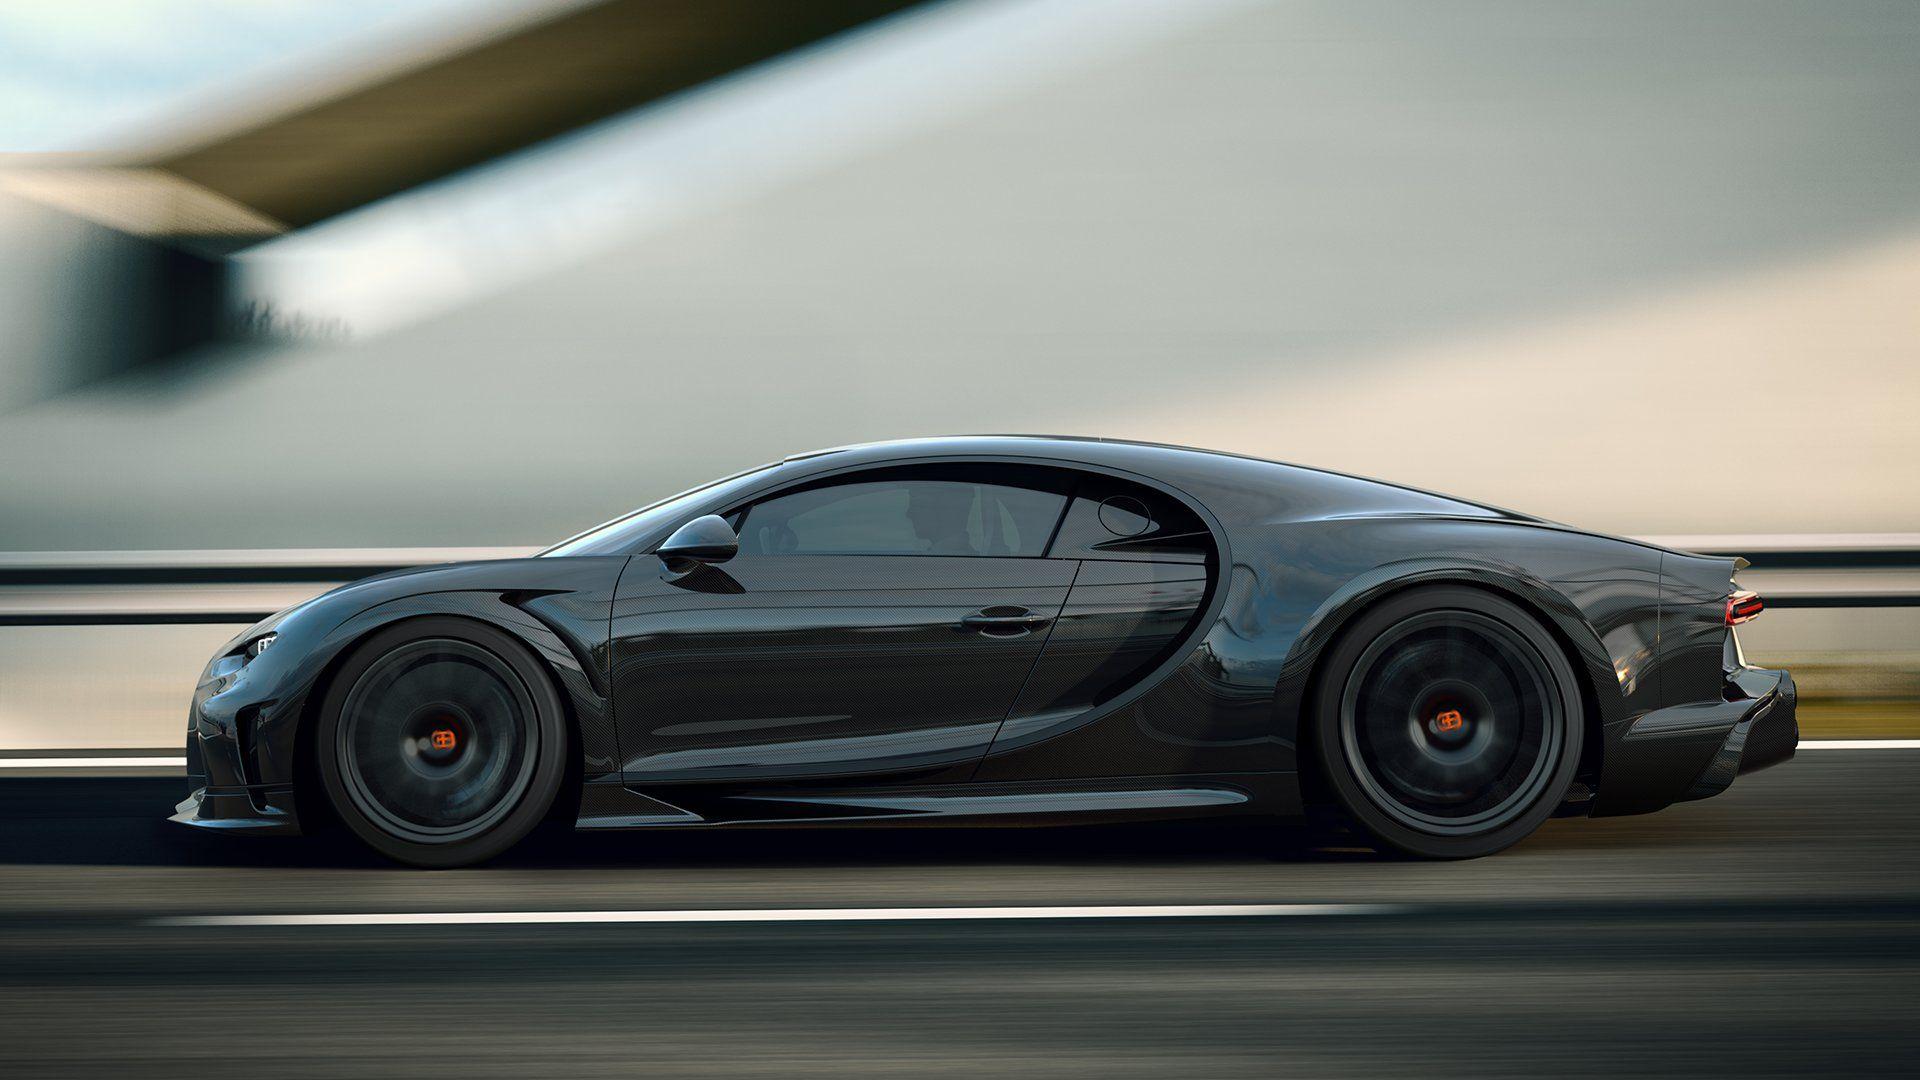 Bugatti Chiron Super Sport 300 Bugatti Chiron Sports Cars Luxury Bugatti